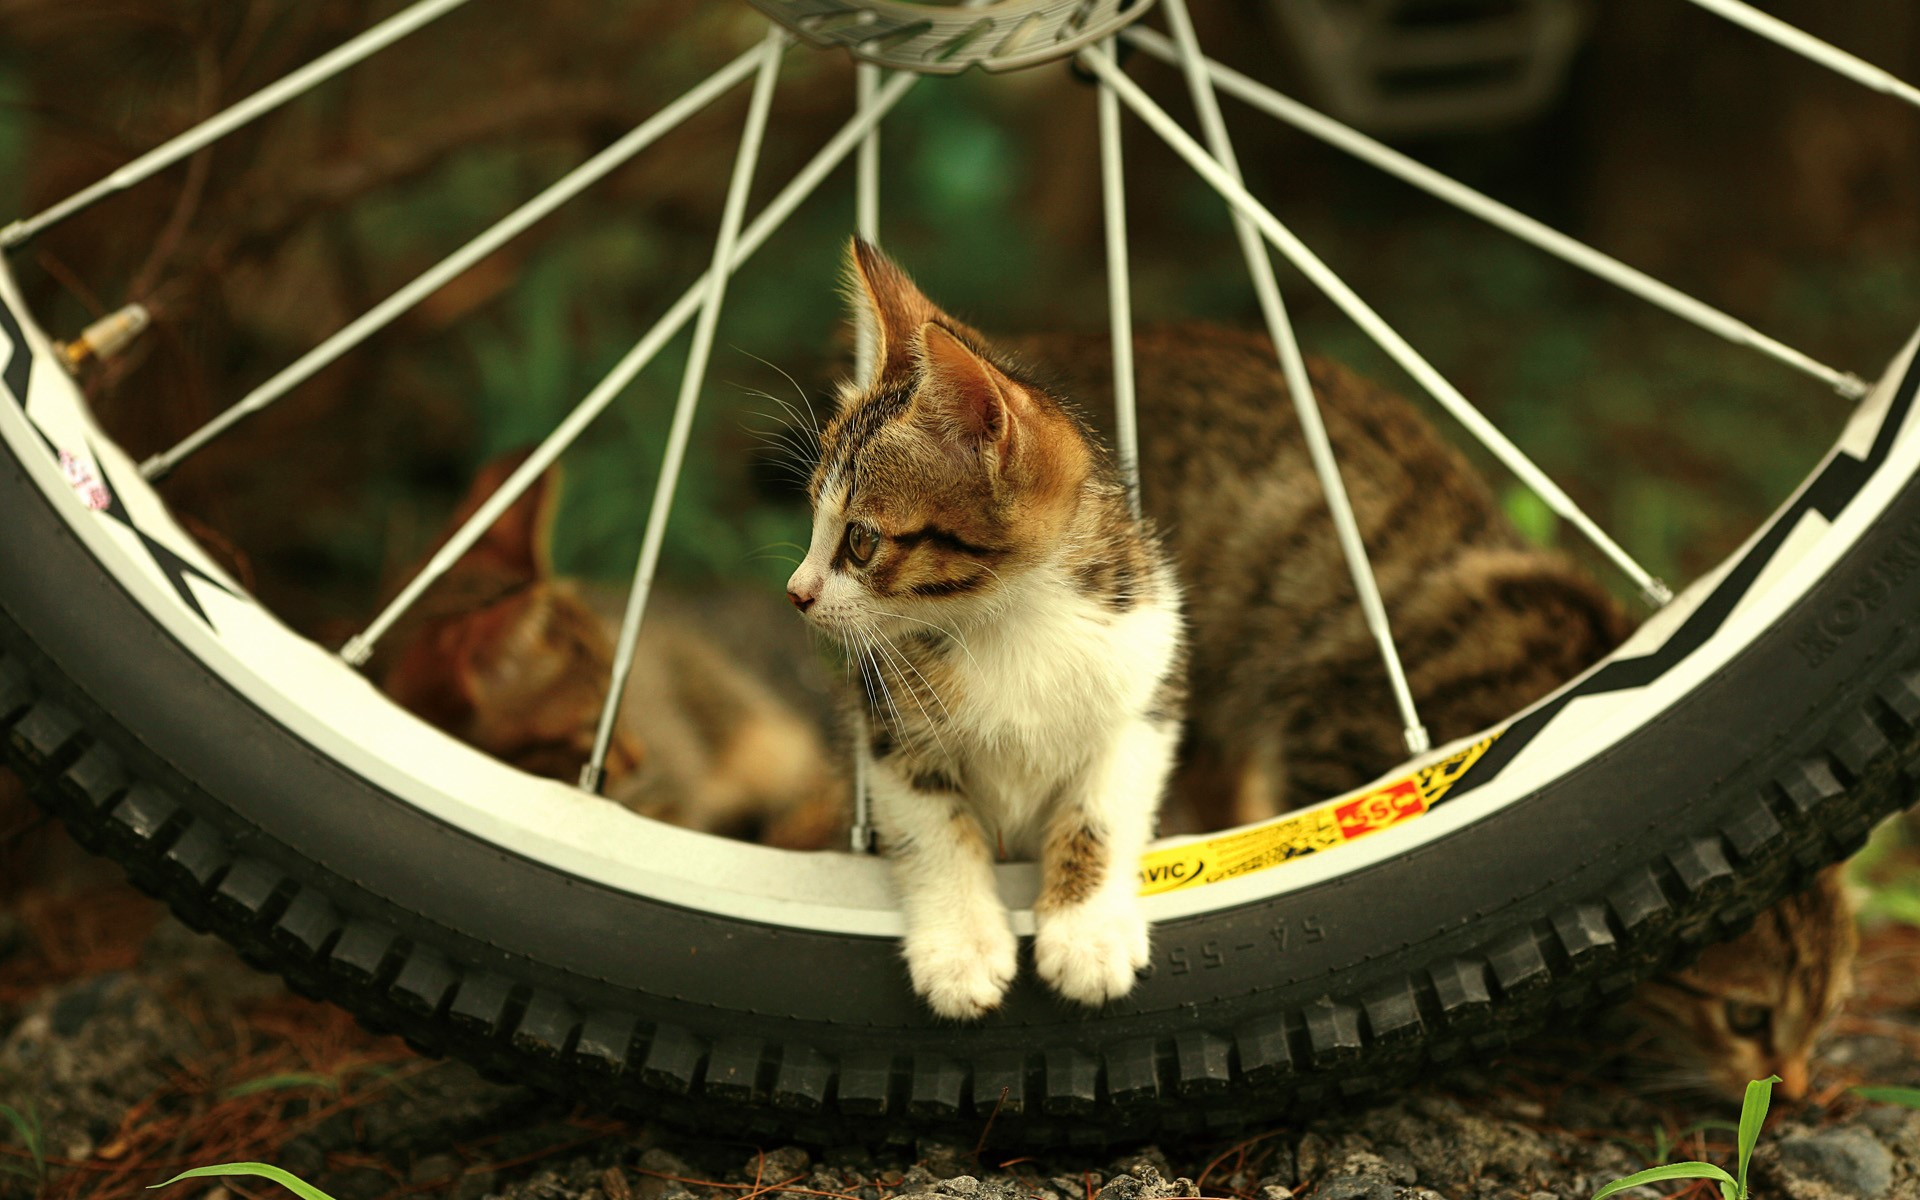 Amazing Beautiful Cute Kitten in Cycle Wheel Wallpaper HD Wallpapers 1920x1200